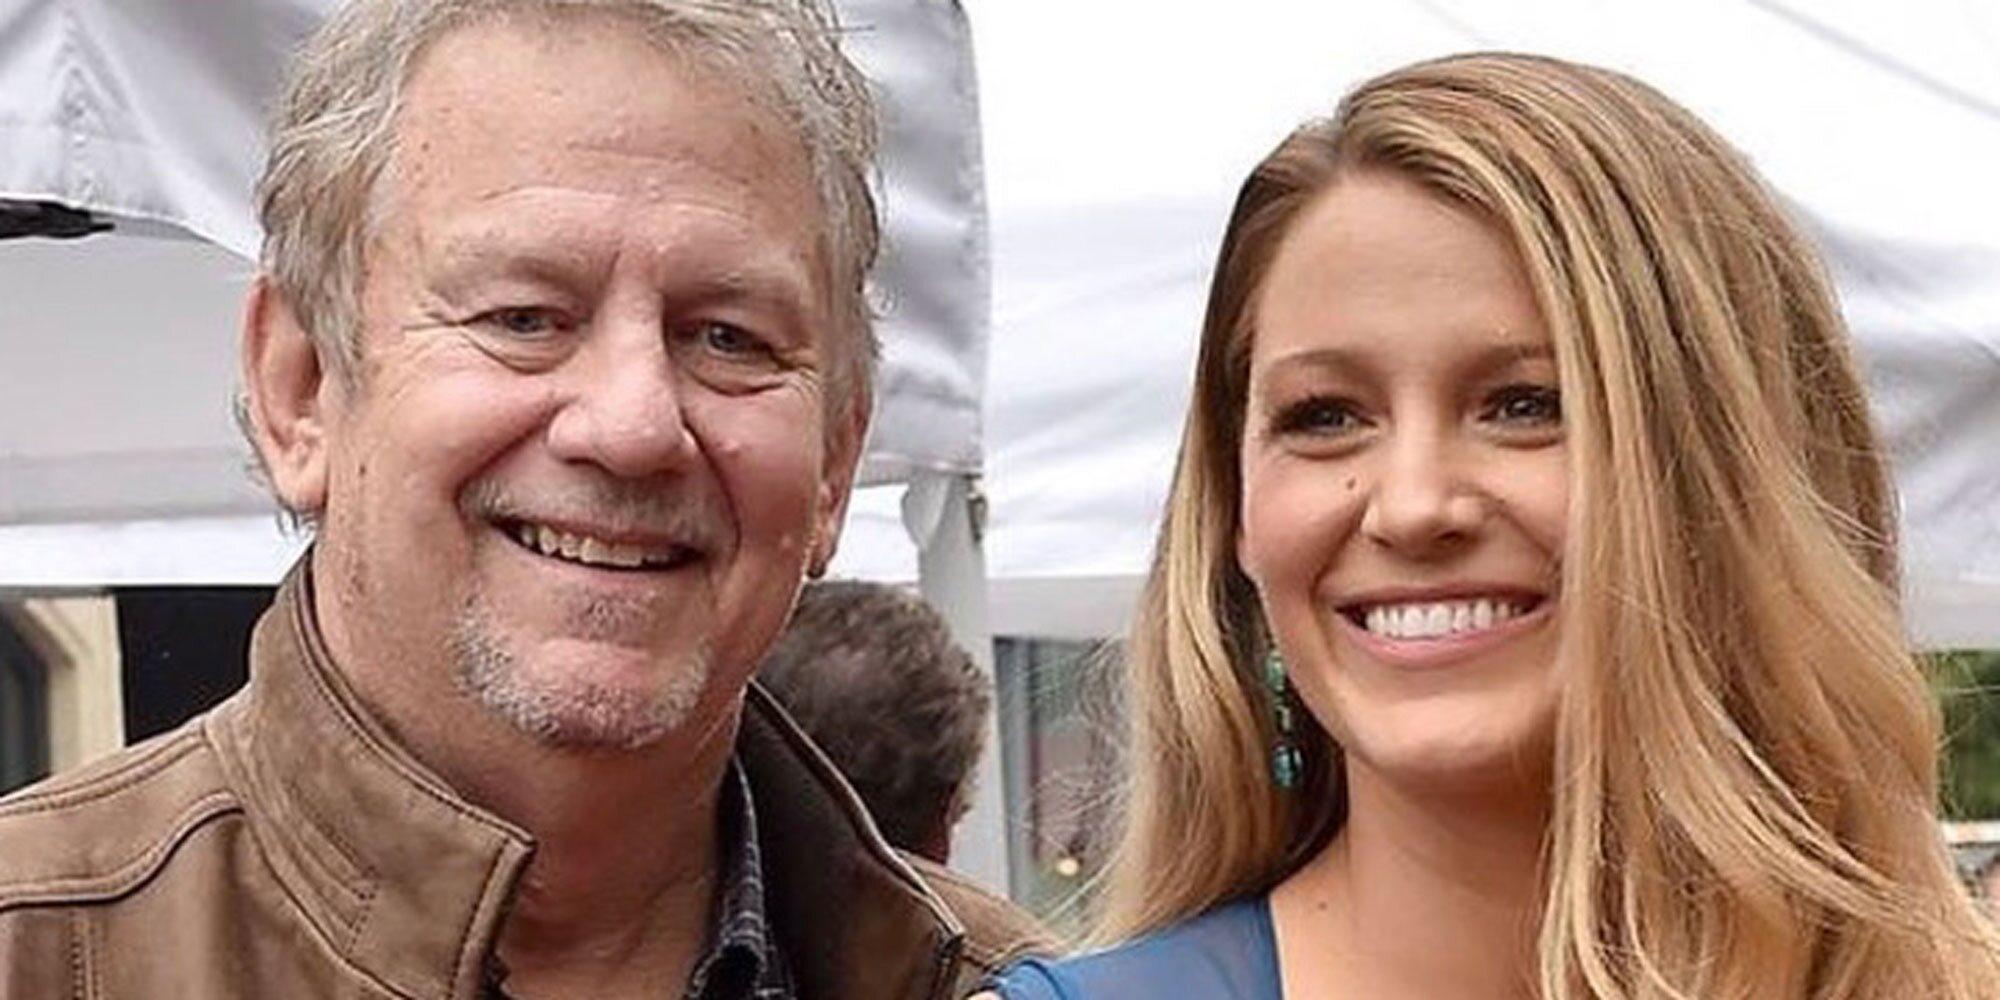 Muere el padre de Blake Lively, Ernie Lively, tras sufrir problemas cardíacos